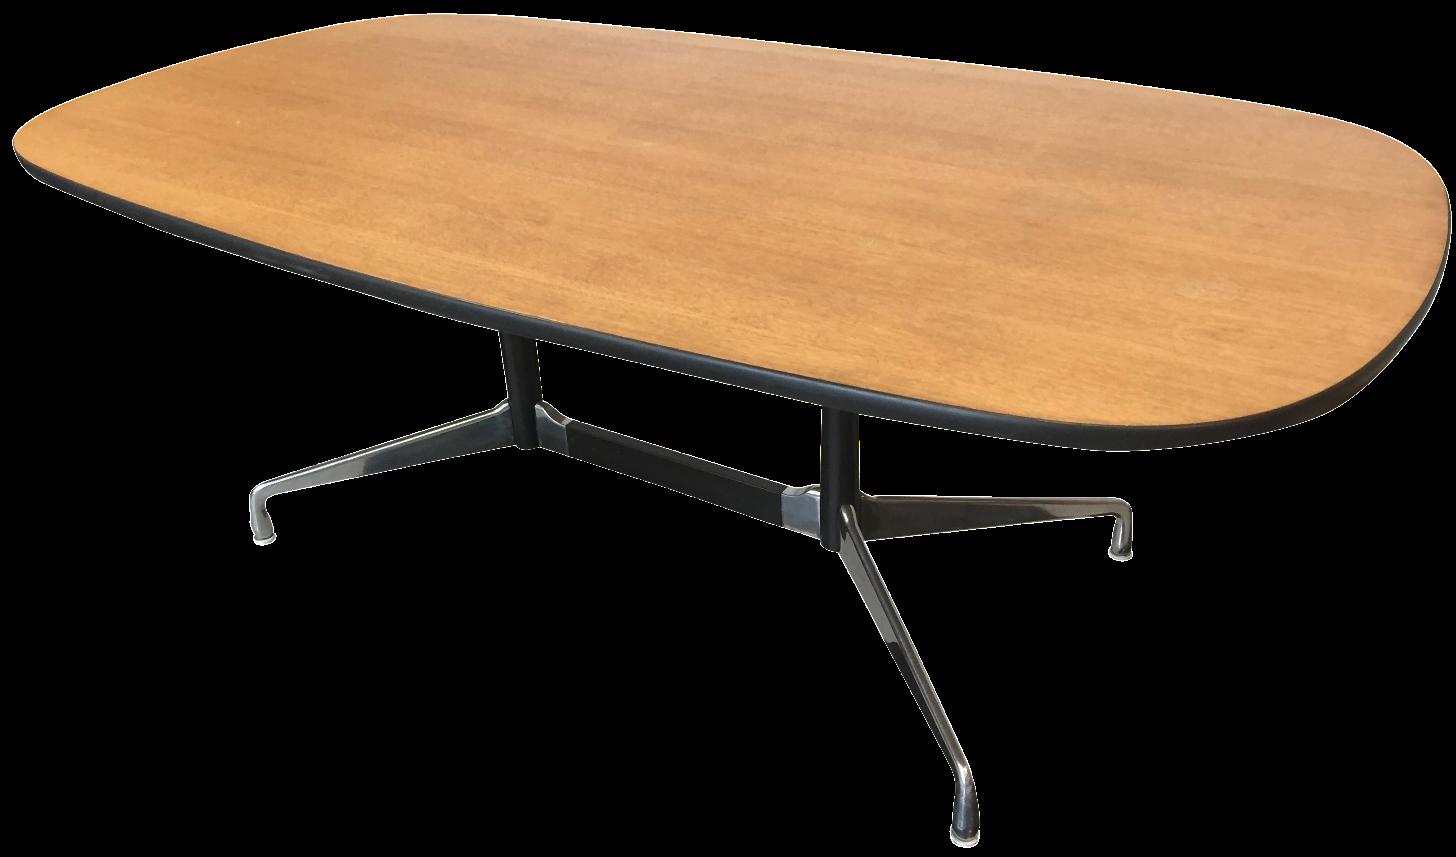 Herman Miller Eames Table